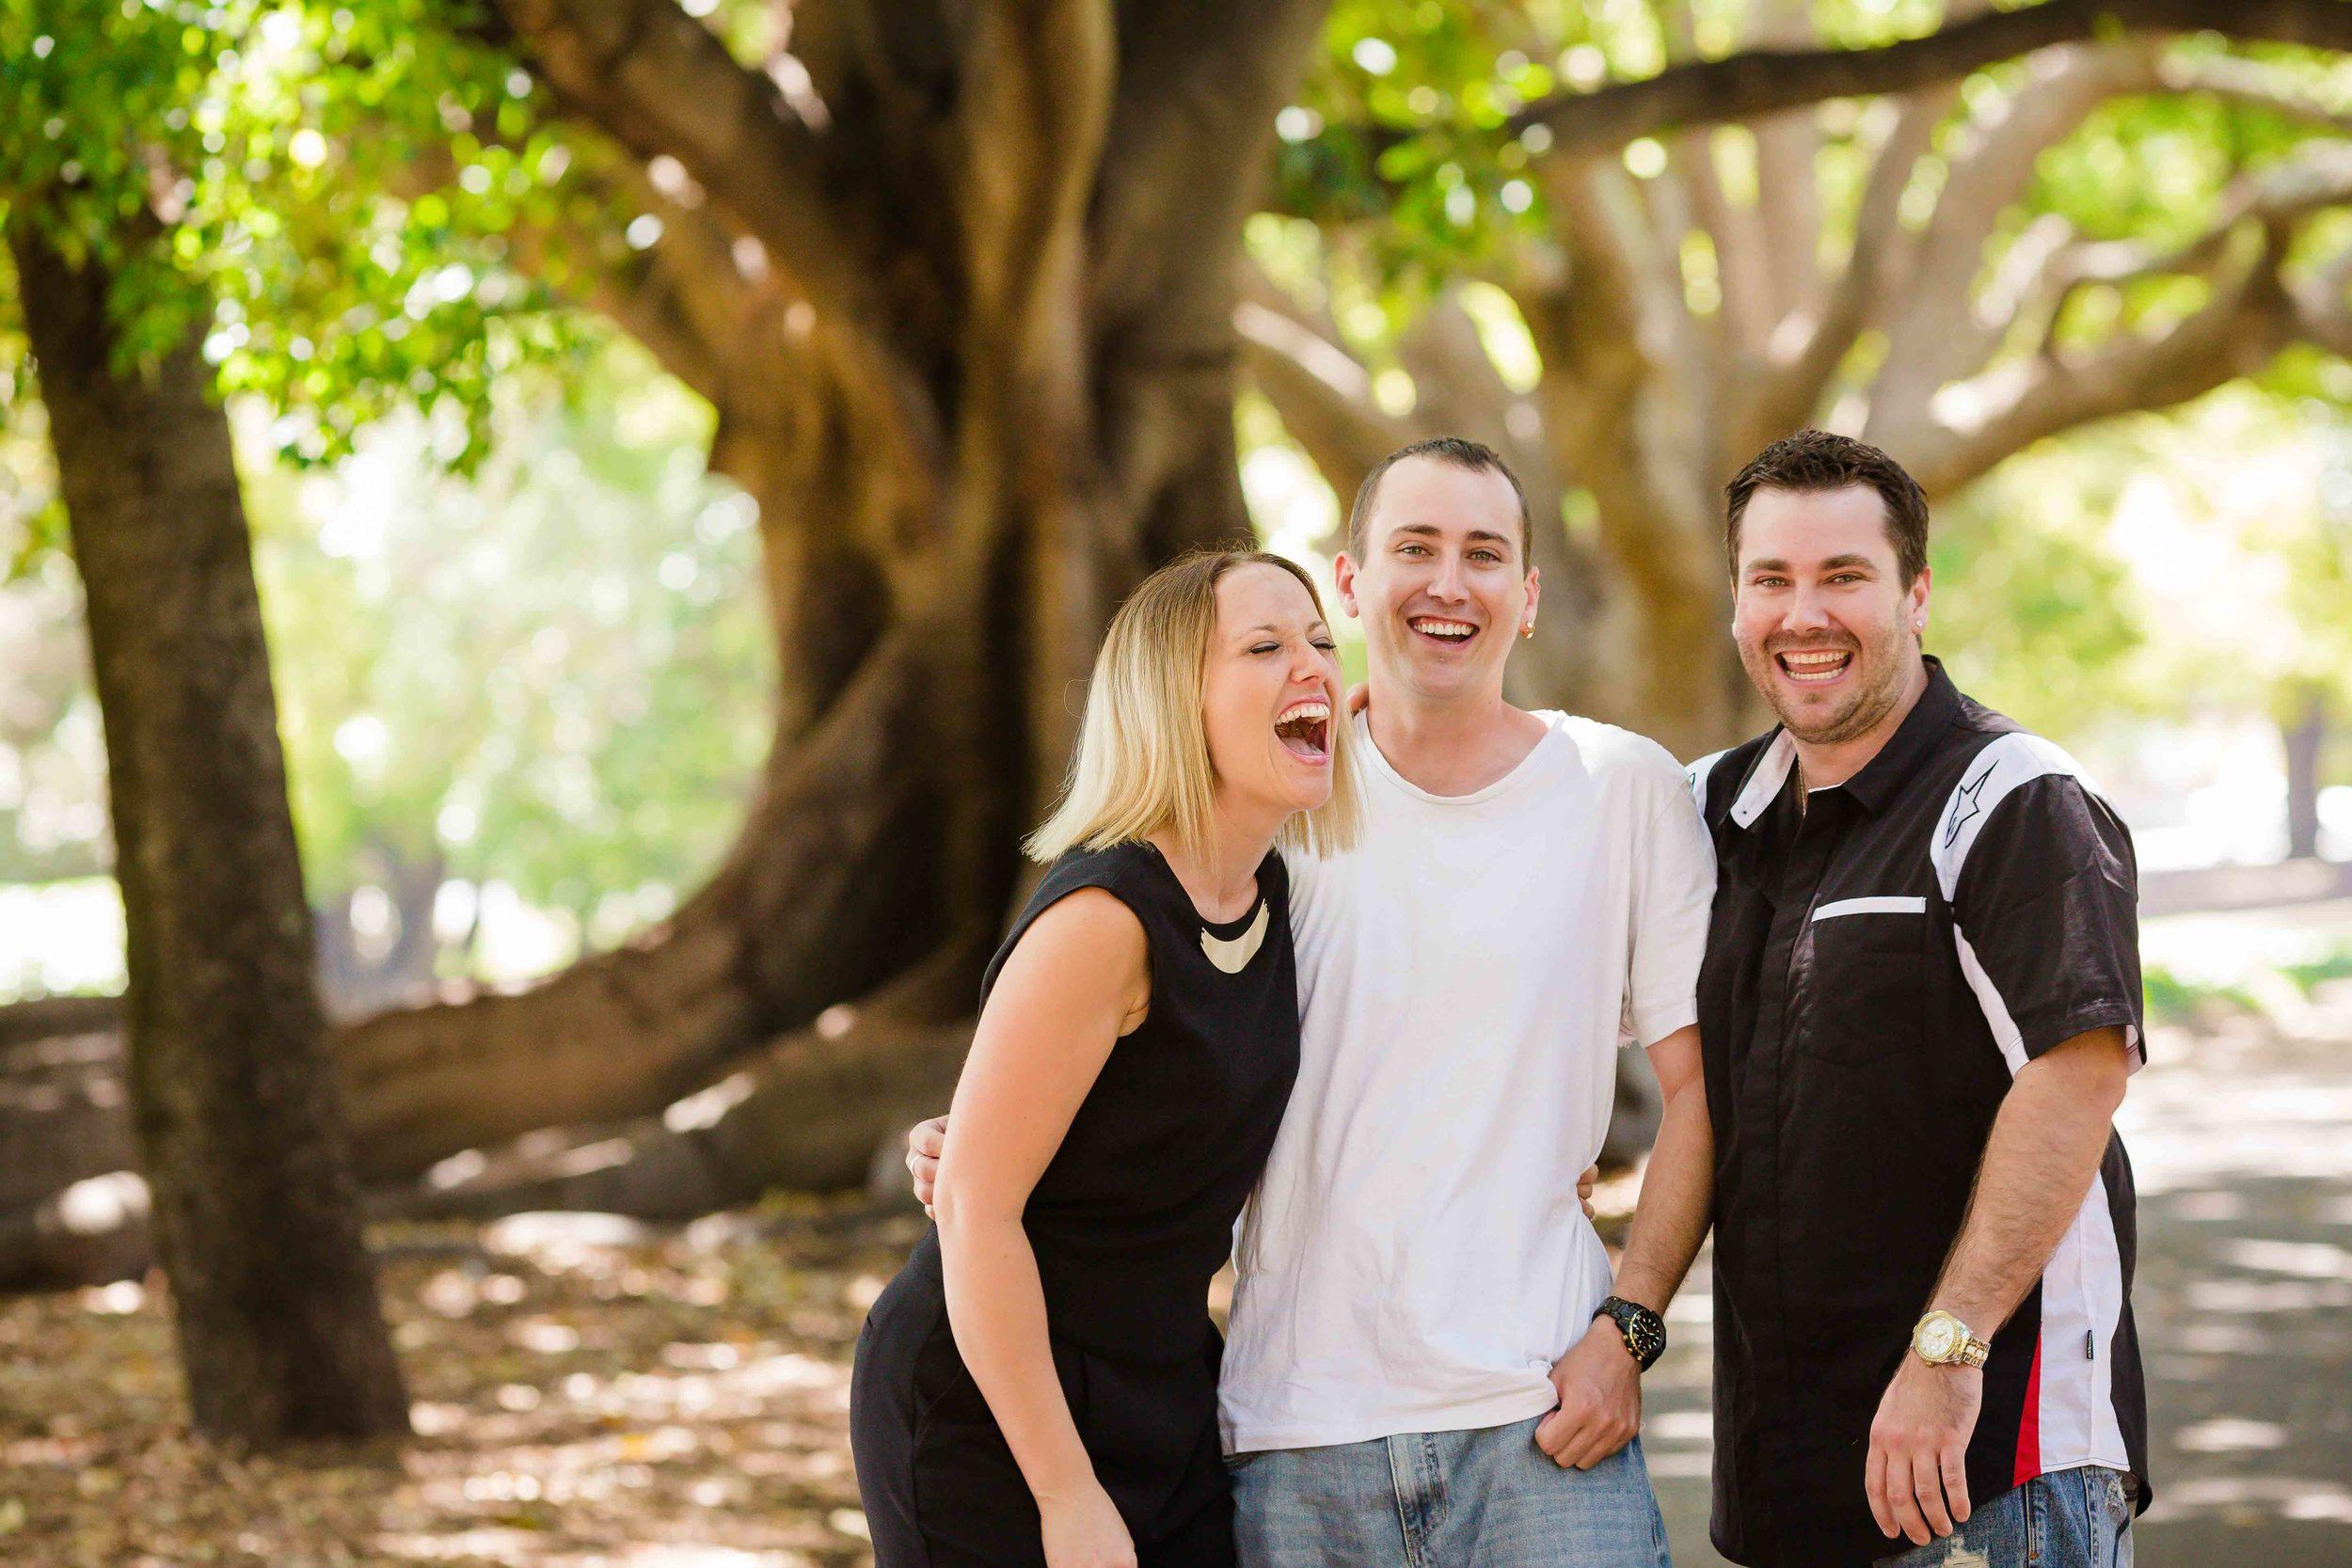 outdoor family portrait perth